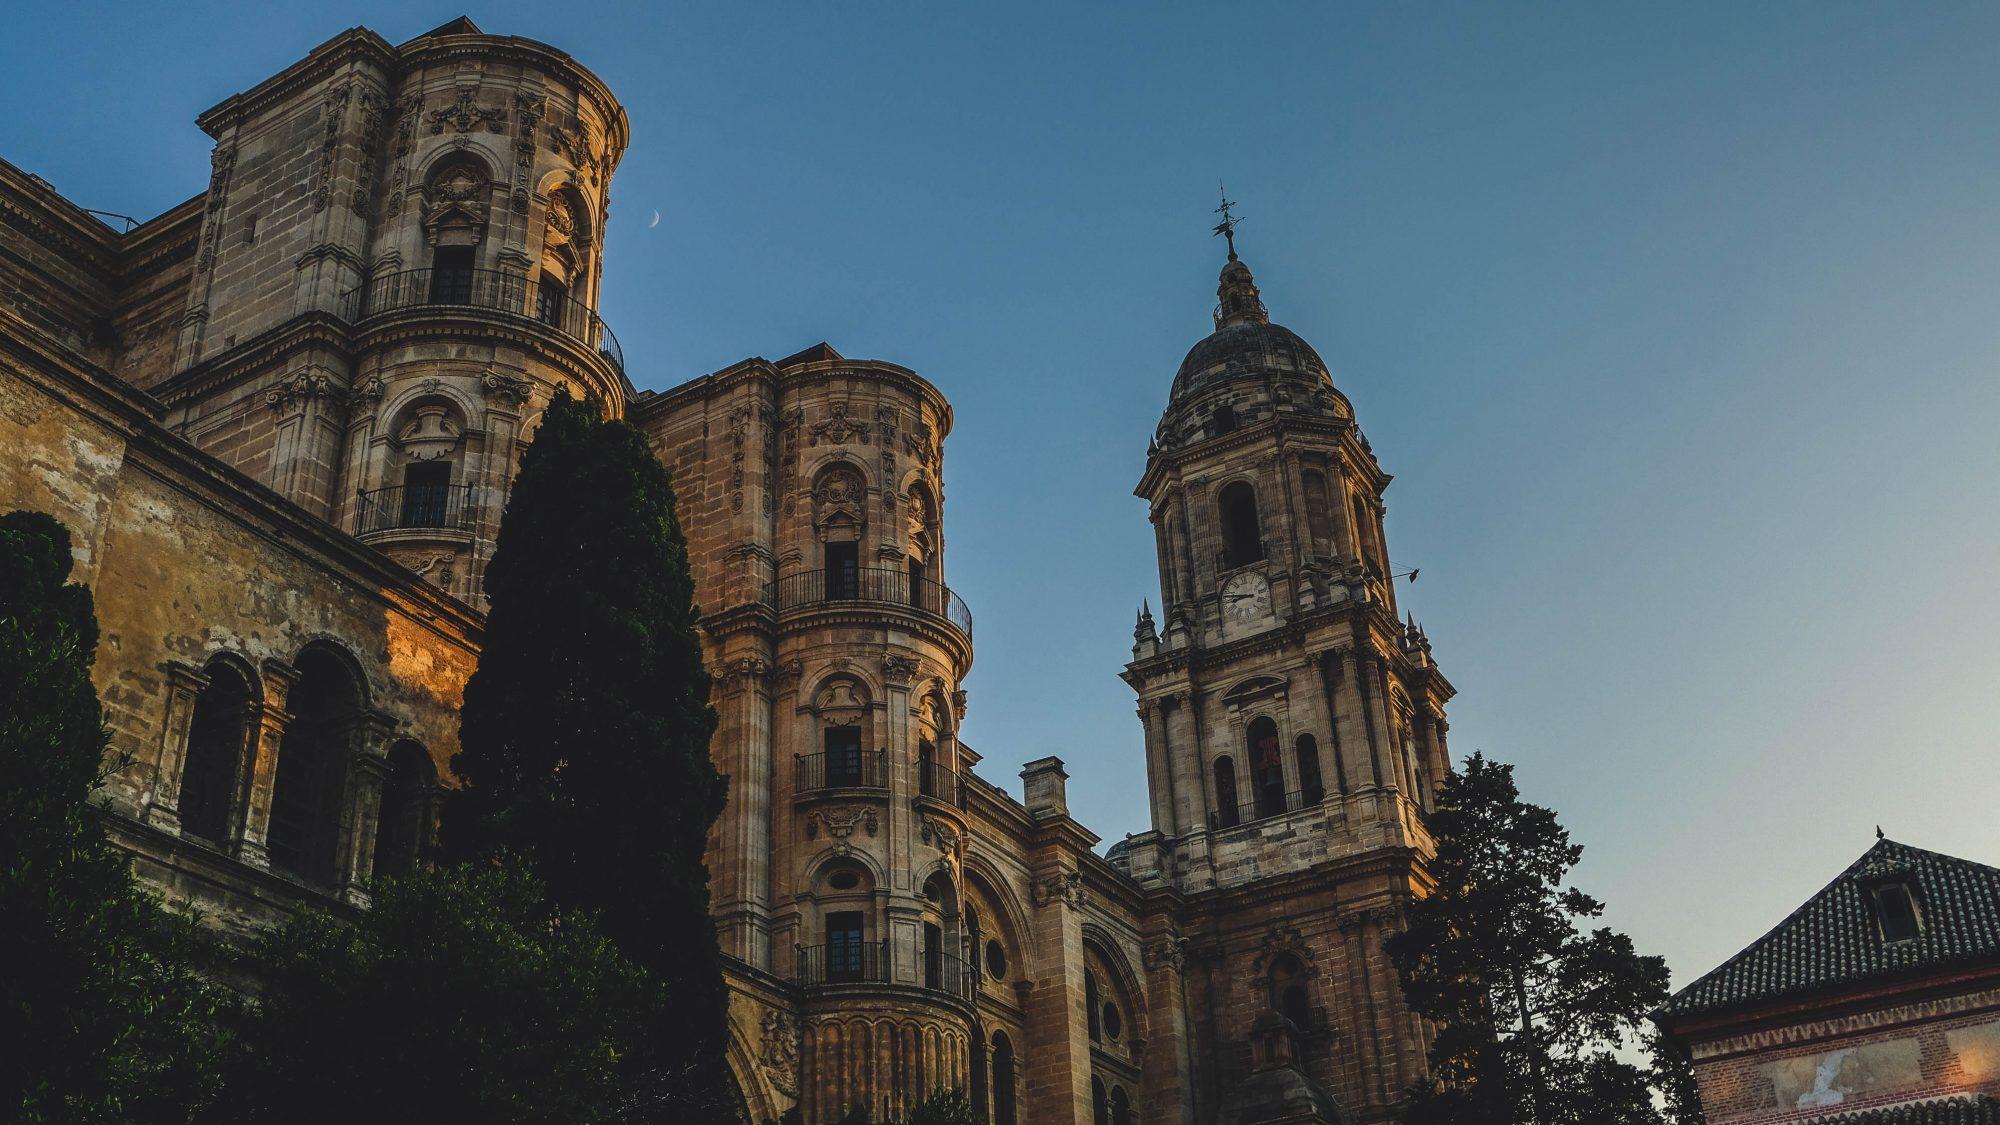 Facade Nord de la cathédrale de la réincarnation de Malaga - Malaga, Espagne